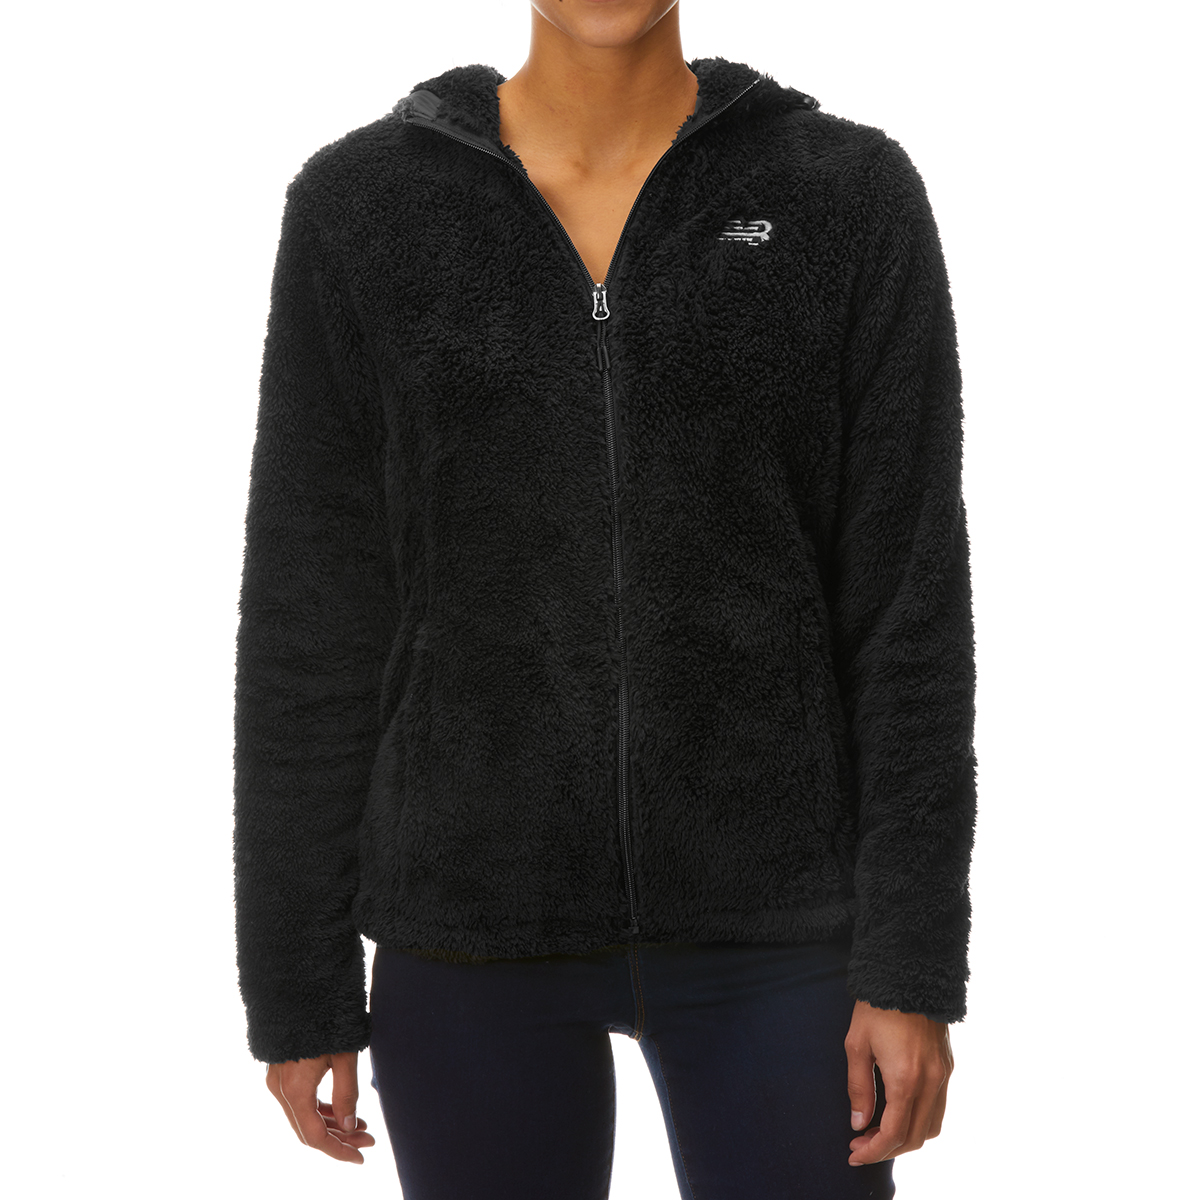 New Balance Women's Full Zip Sherpa Hooded Jacket - Black, XL